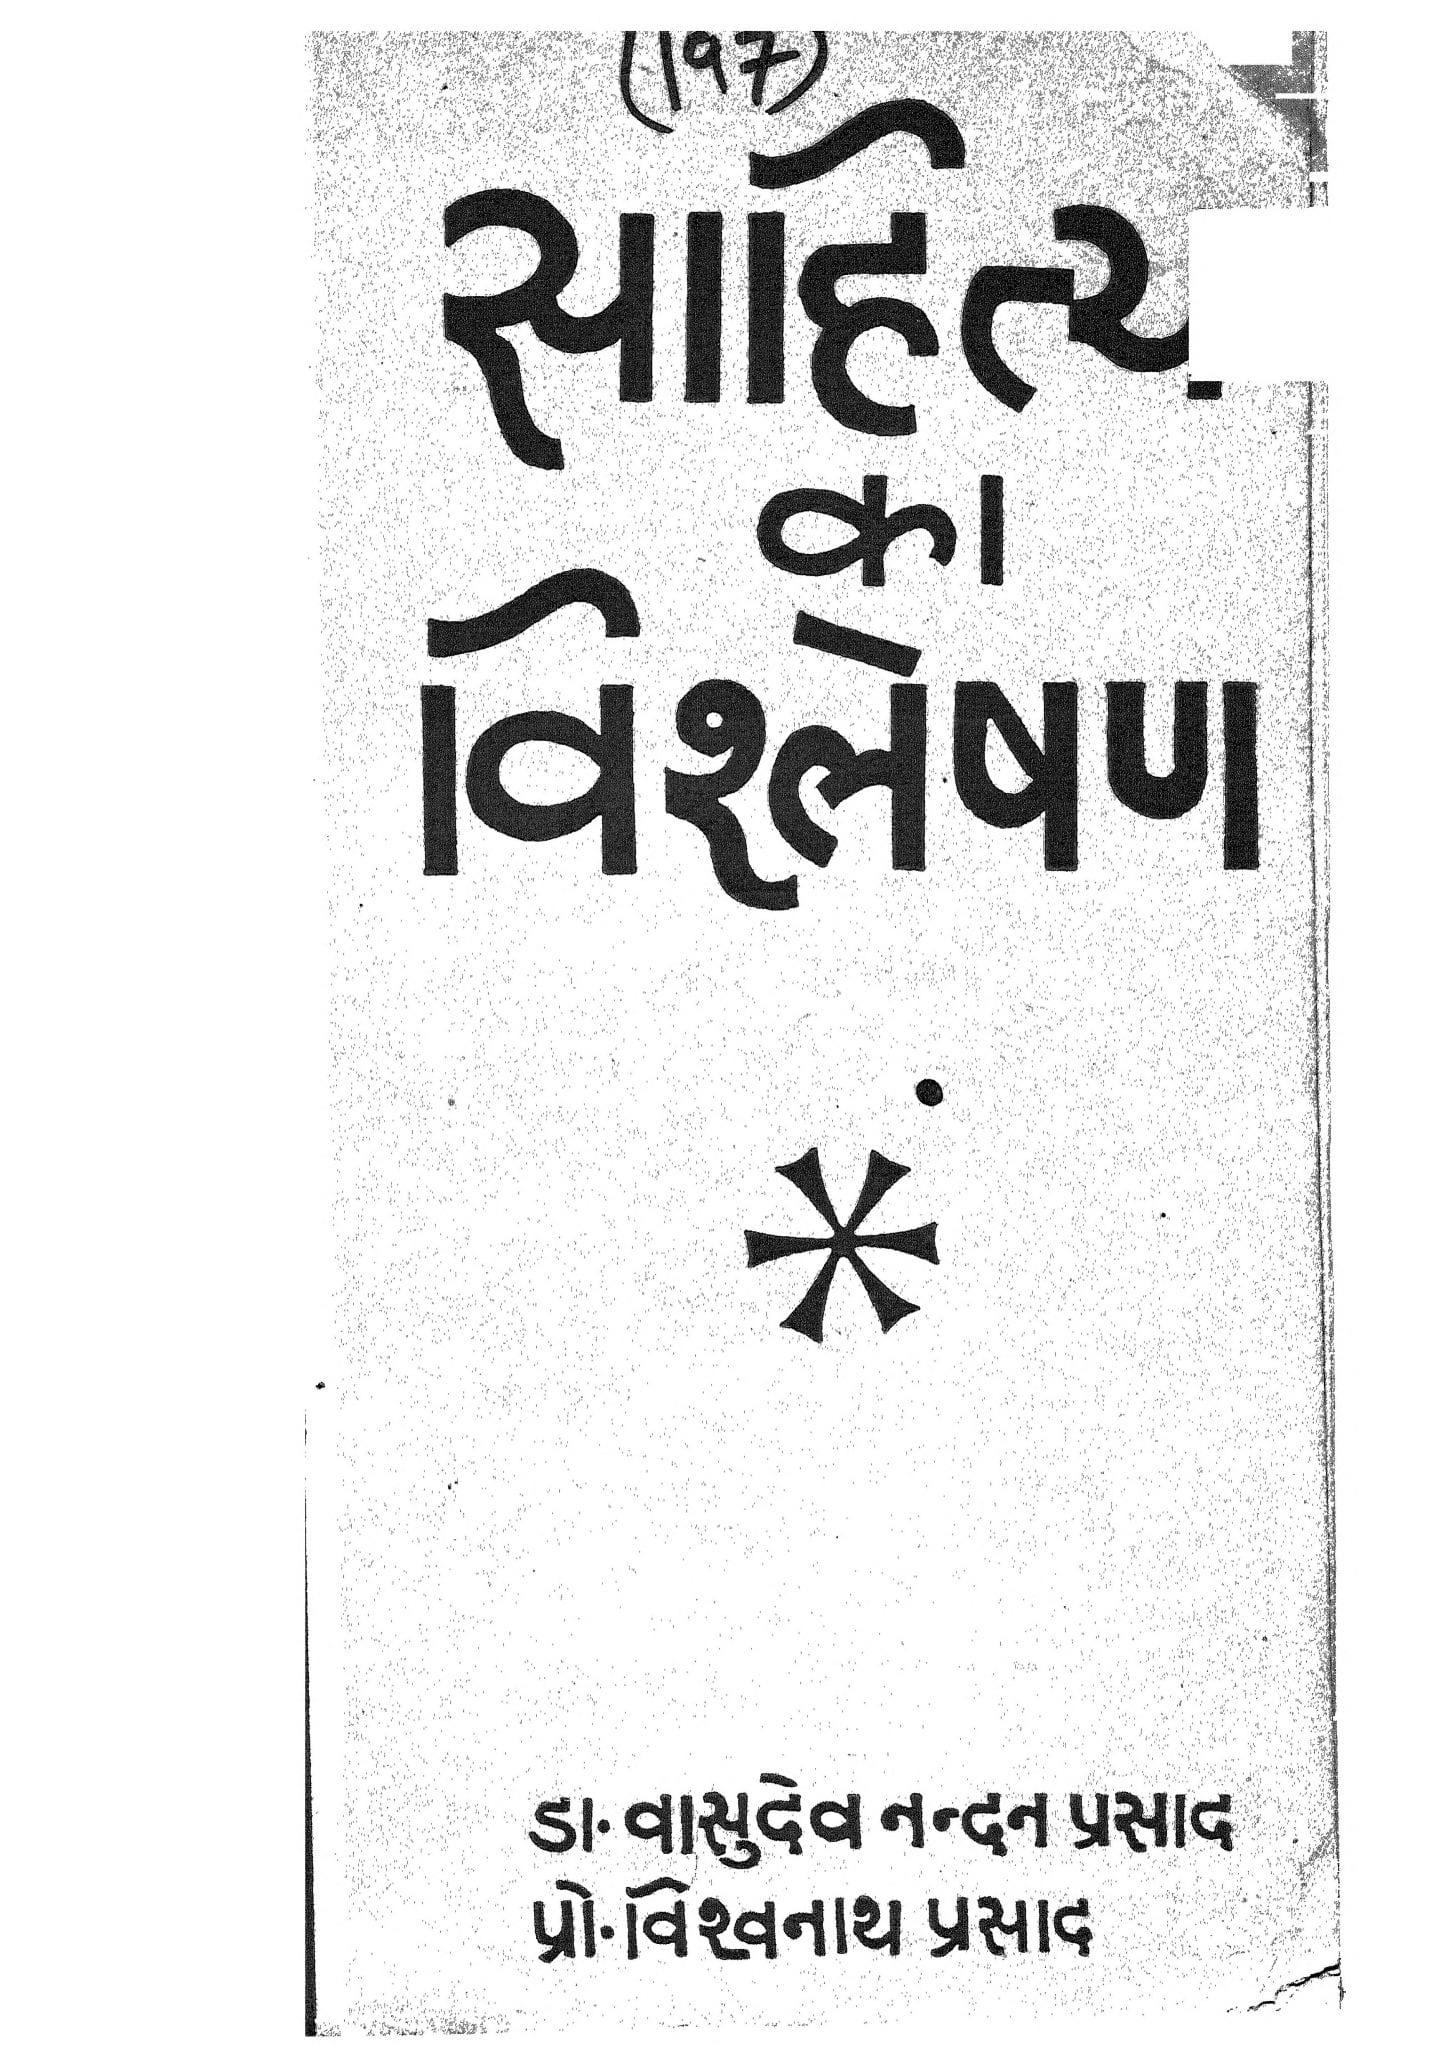 Sahitya Ka Vishleshan by वासुदेव नन्दन प्रसाद - Vasudev Nandan Prasadविश्वनाथ प्रसाद - Vishvanath Prasad